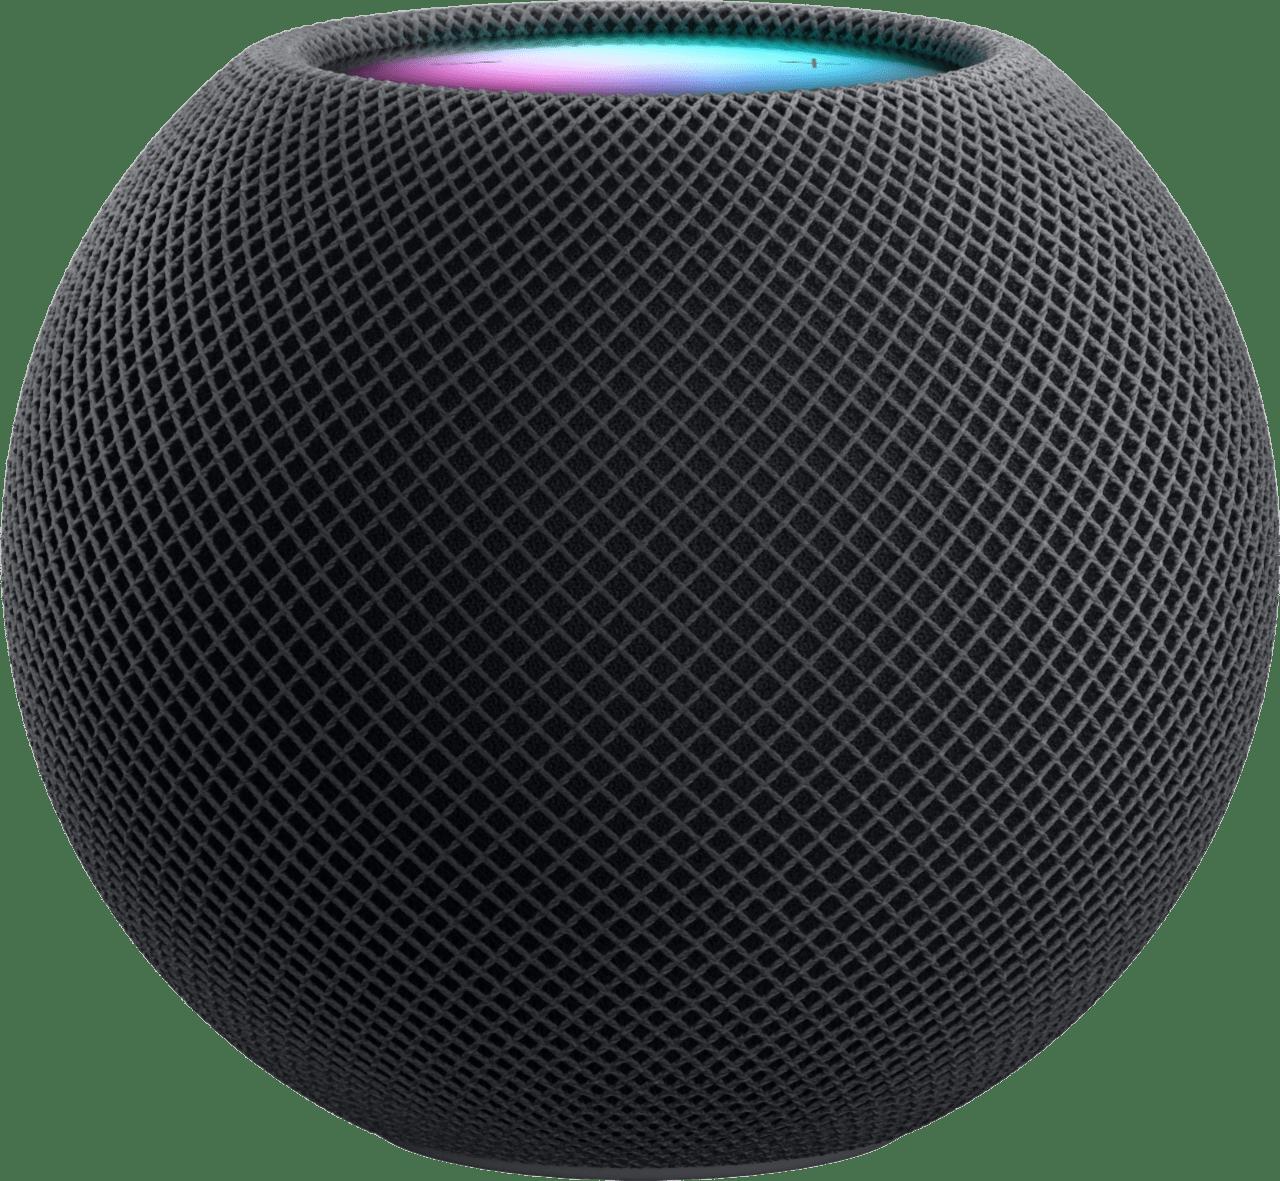 Space Grey Apple HomePod mini.1